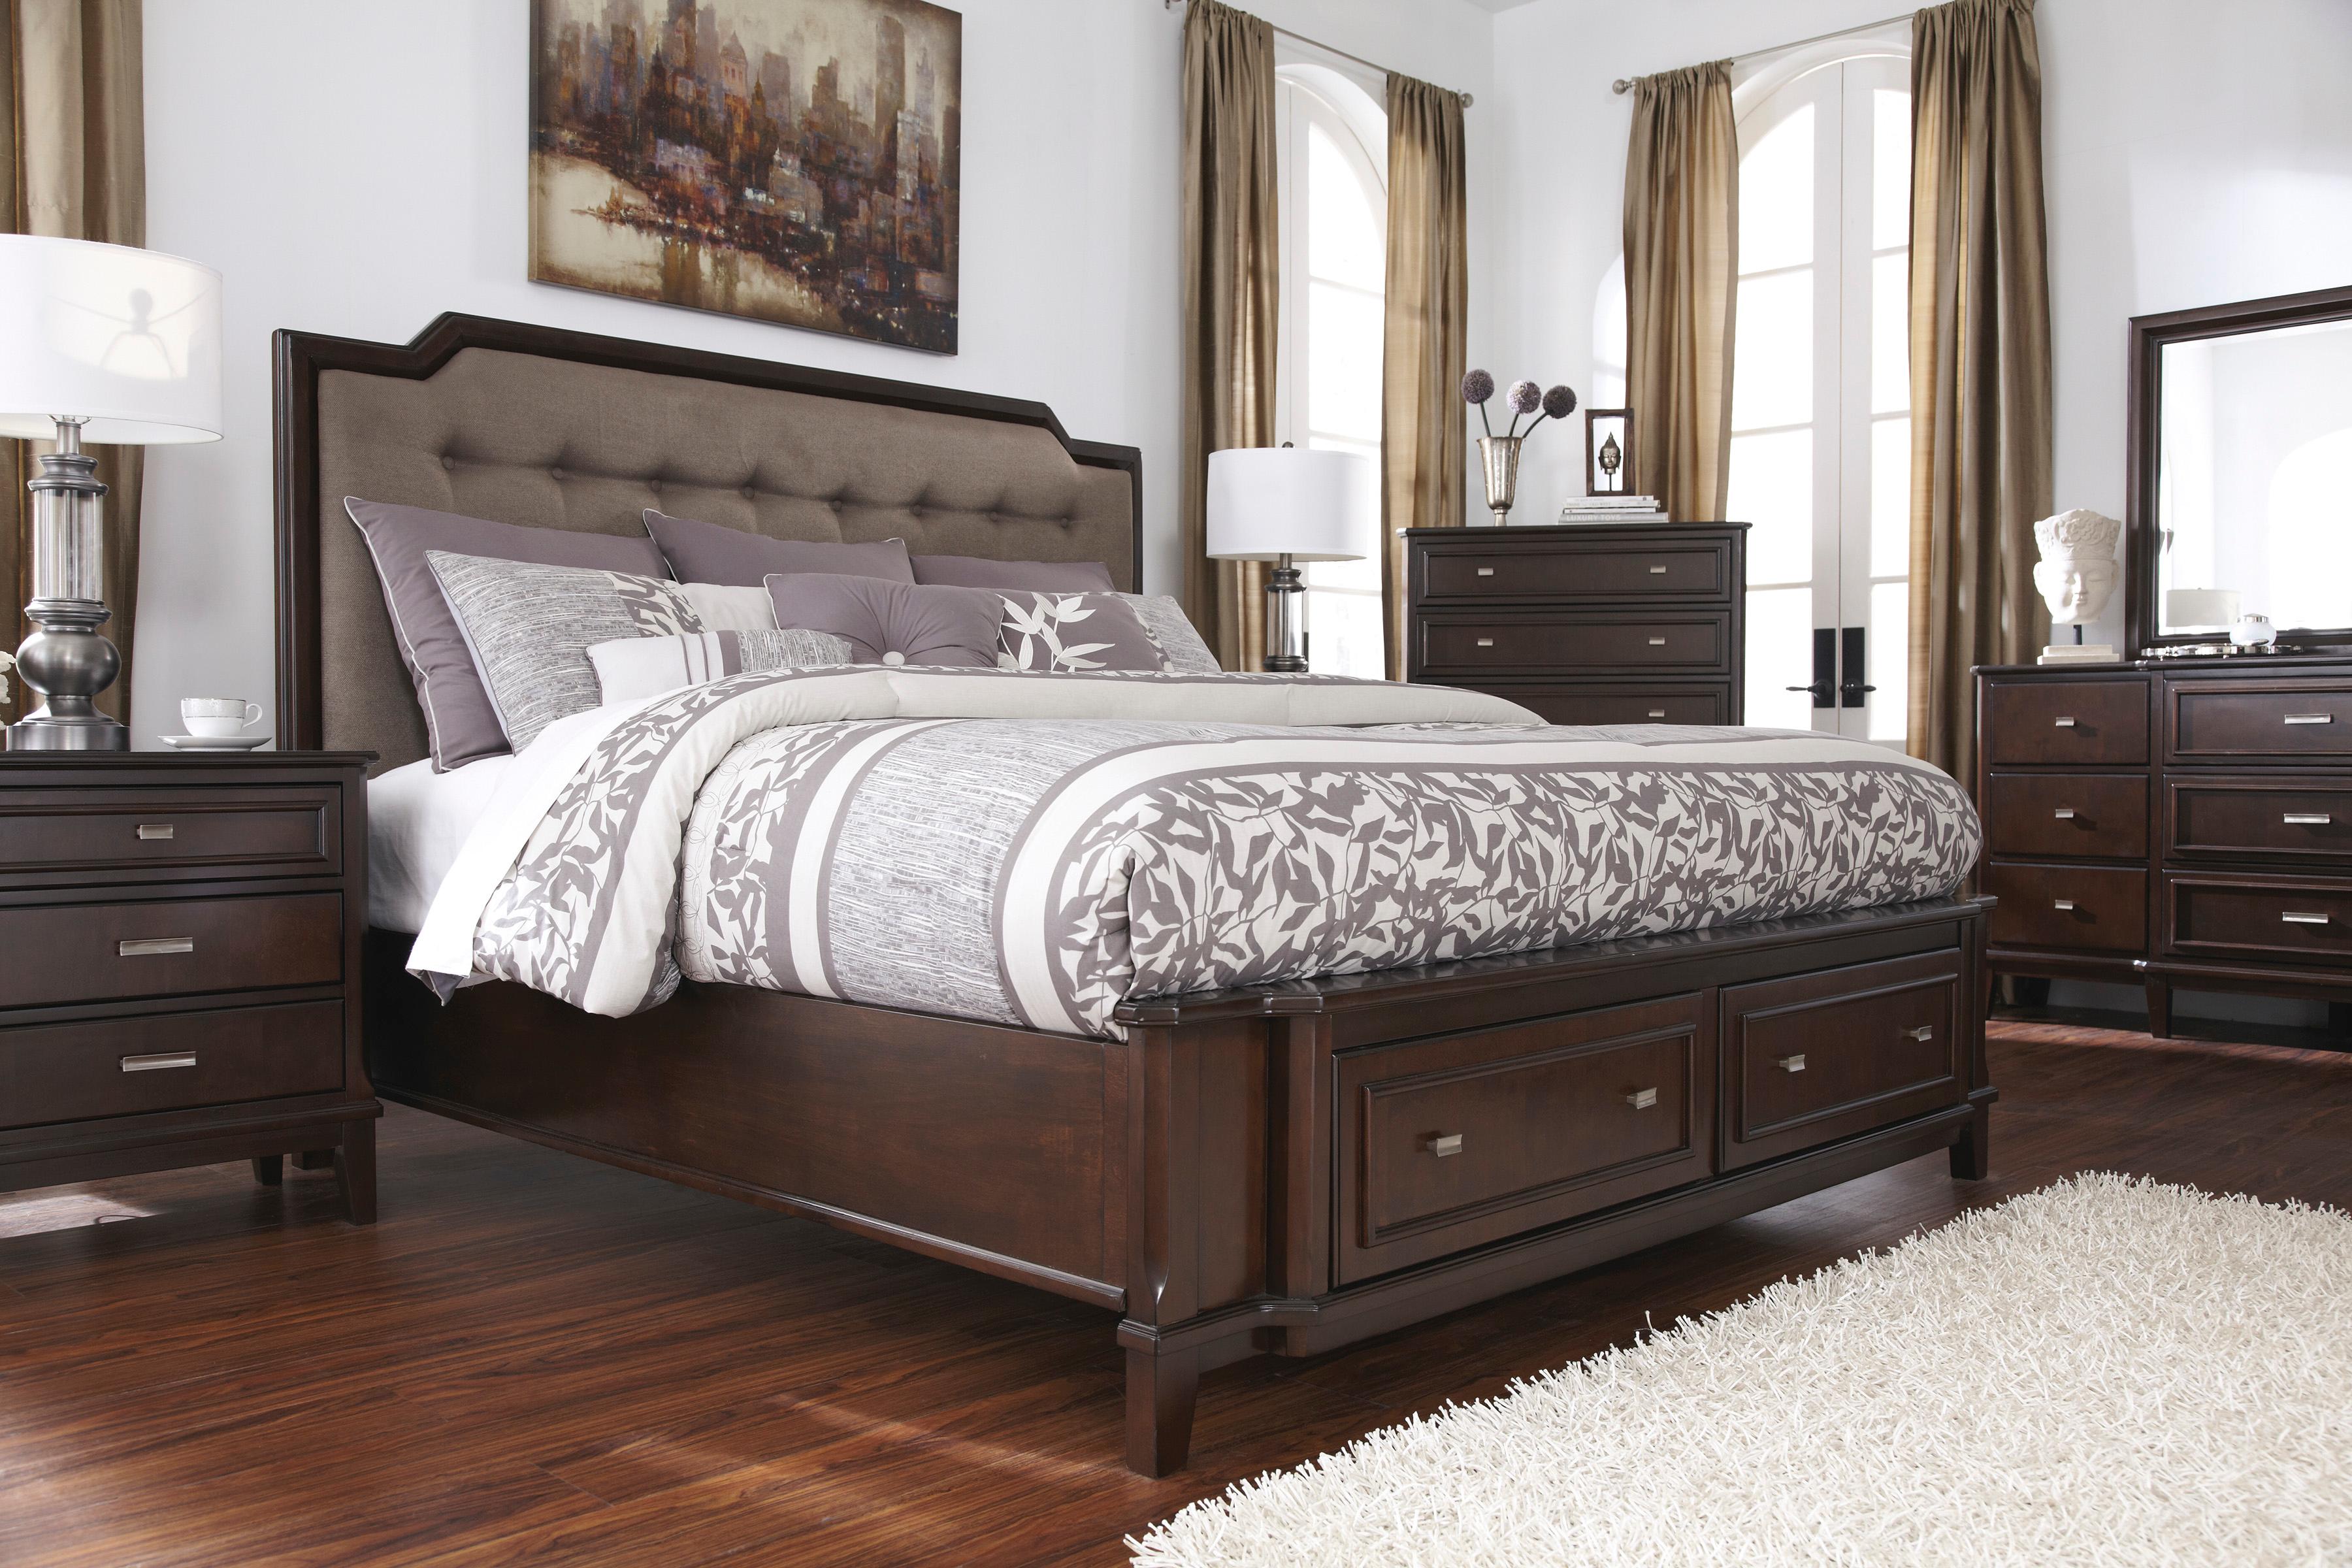 atlantic bedding and furniture marietta in marietta ga